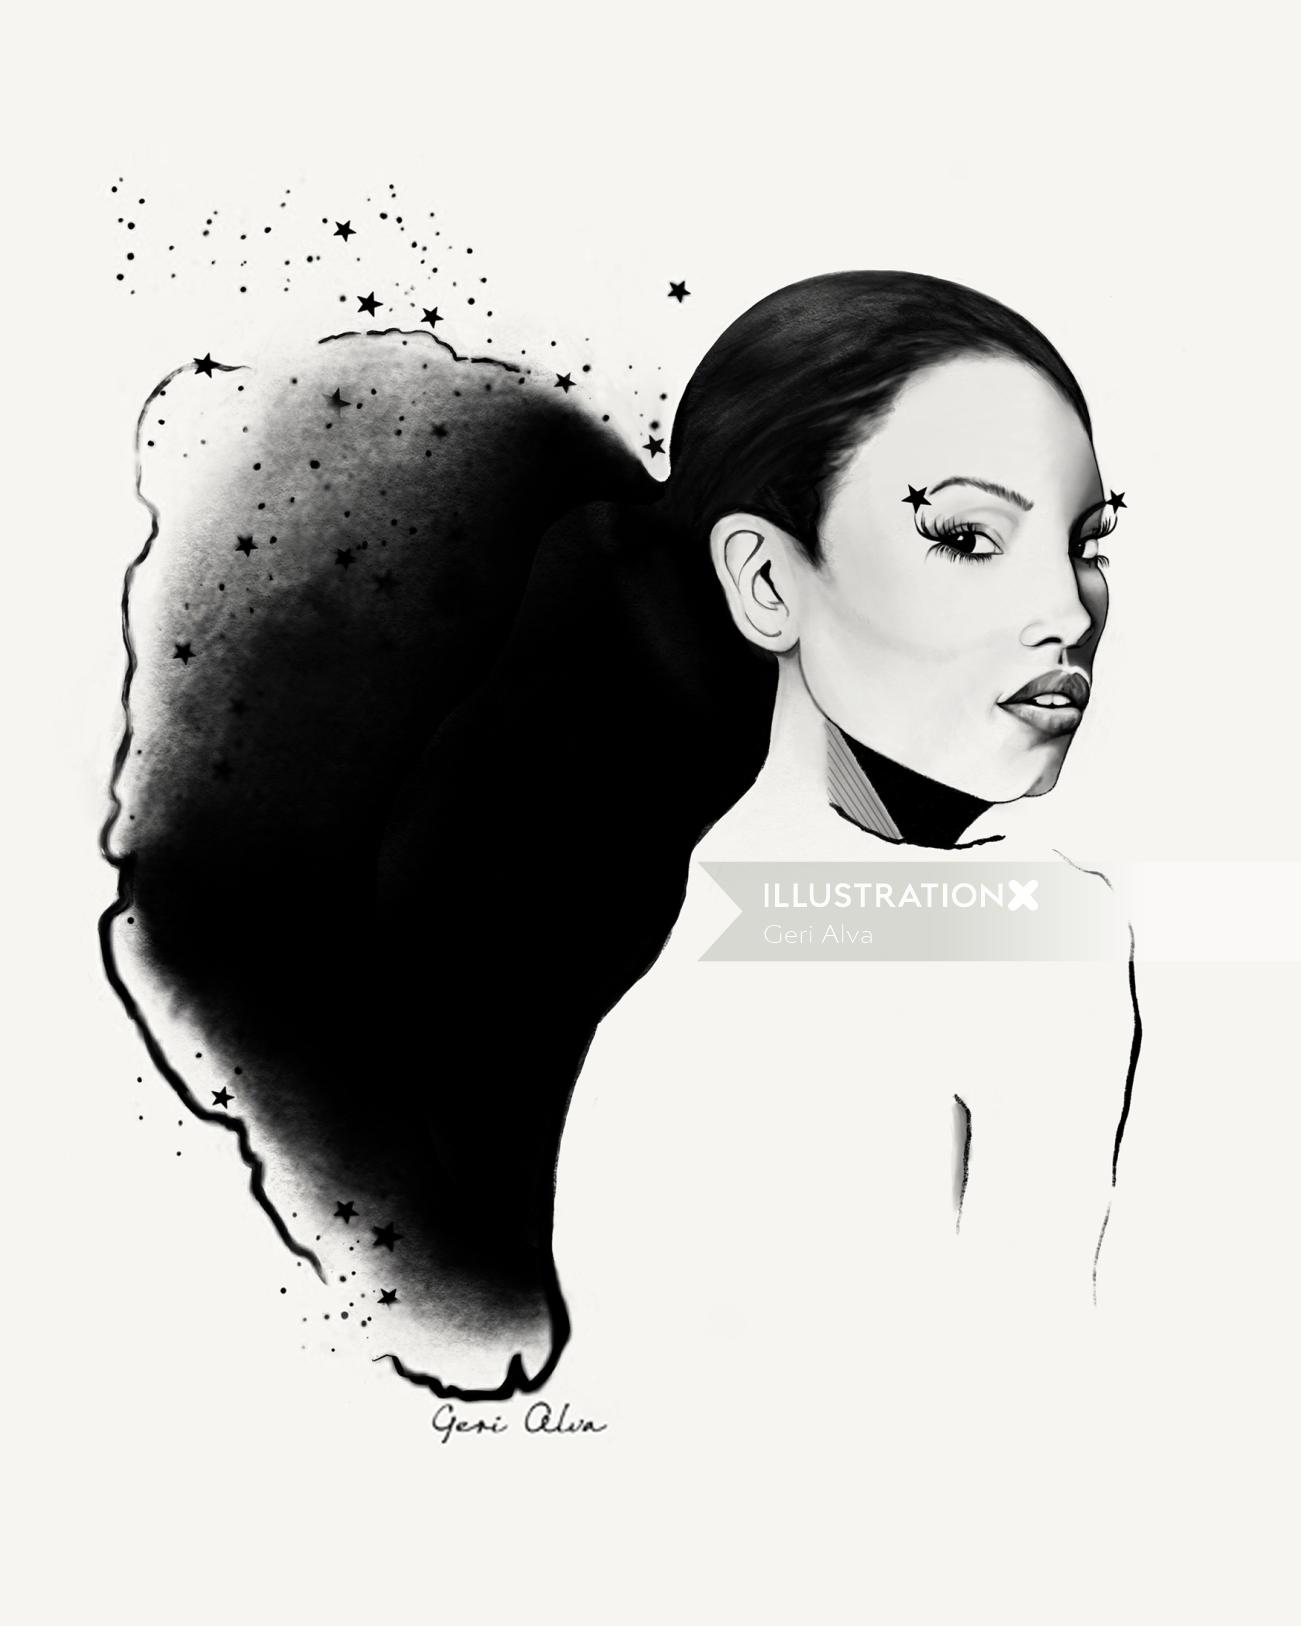 The Star Lady Glamorous Black and White Magazine Editorial illustration